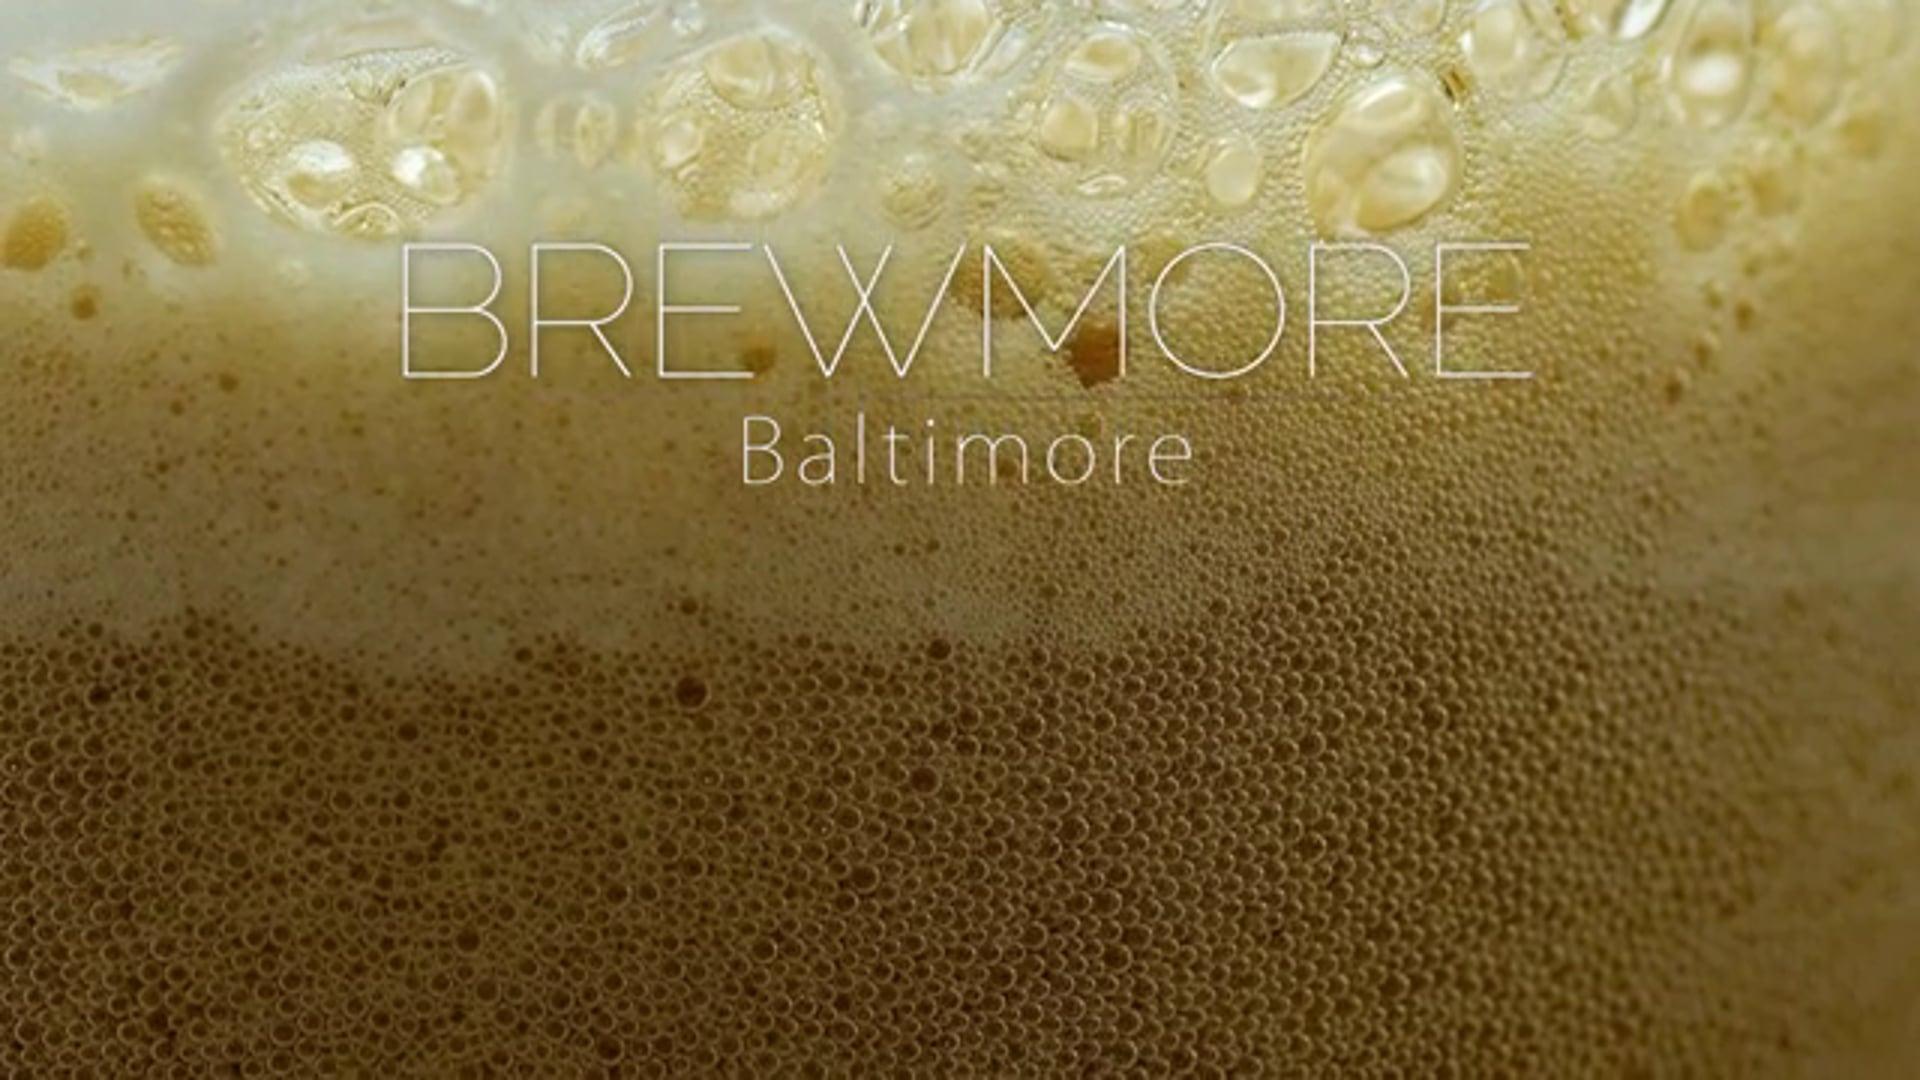 Brewmore Baltimore Trailer 1